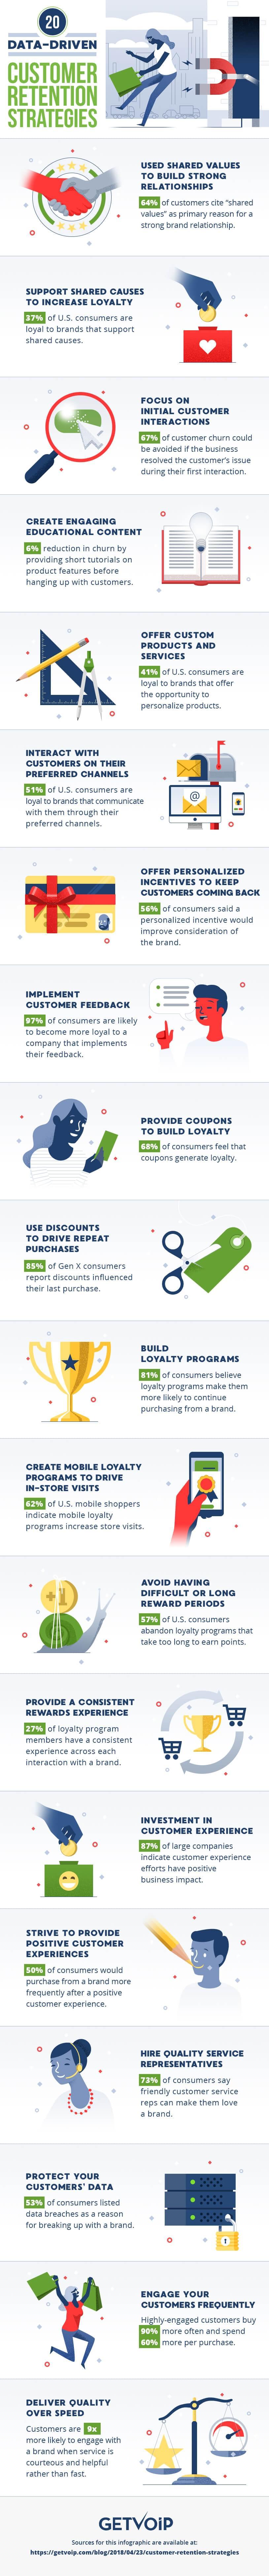 20 data driven customer retention strategies